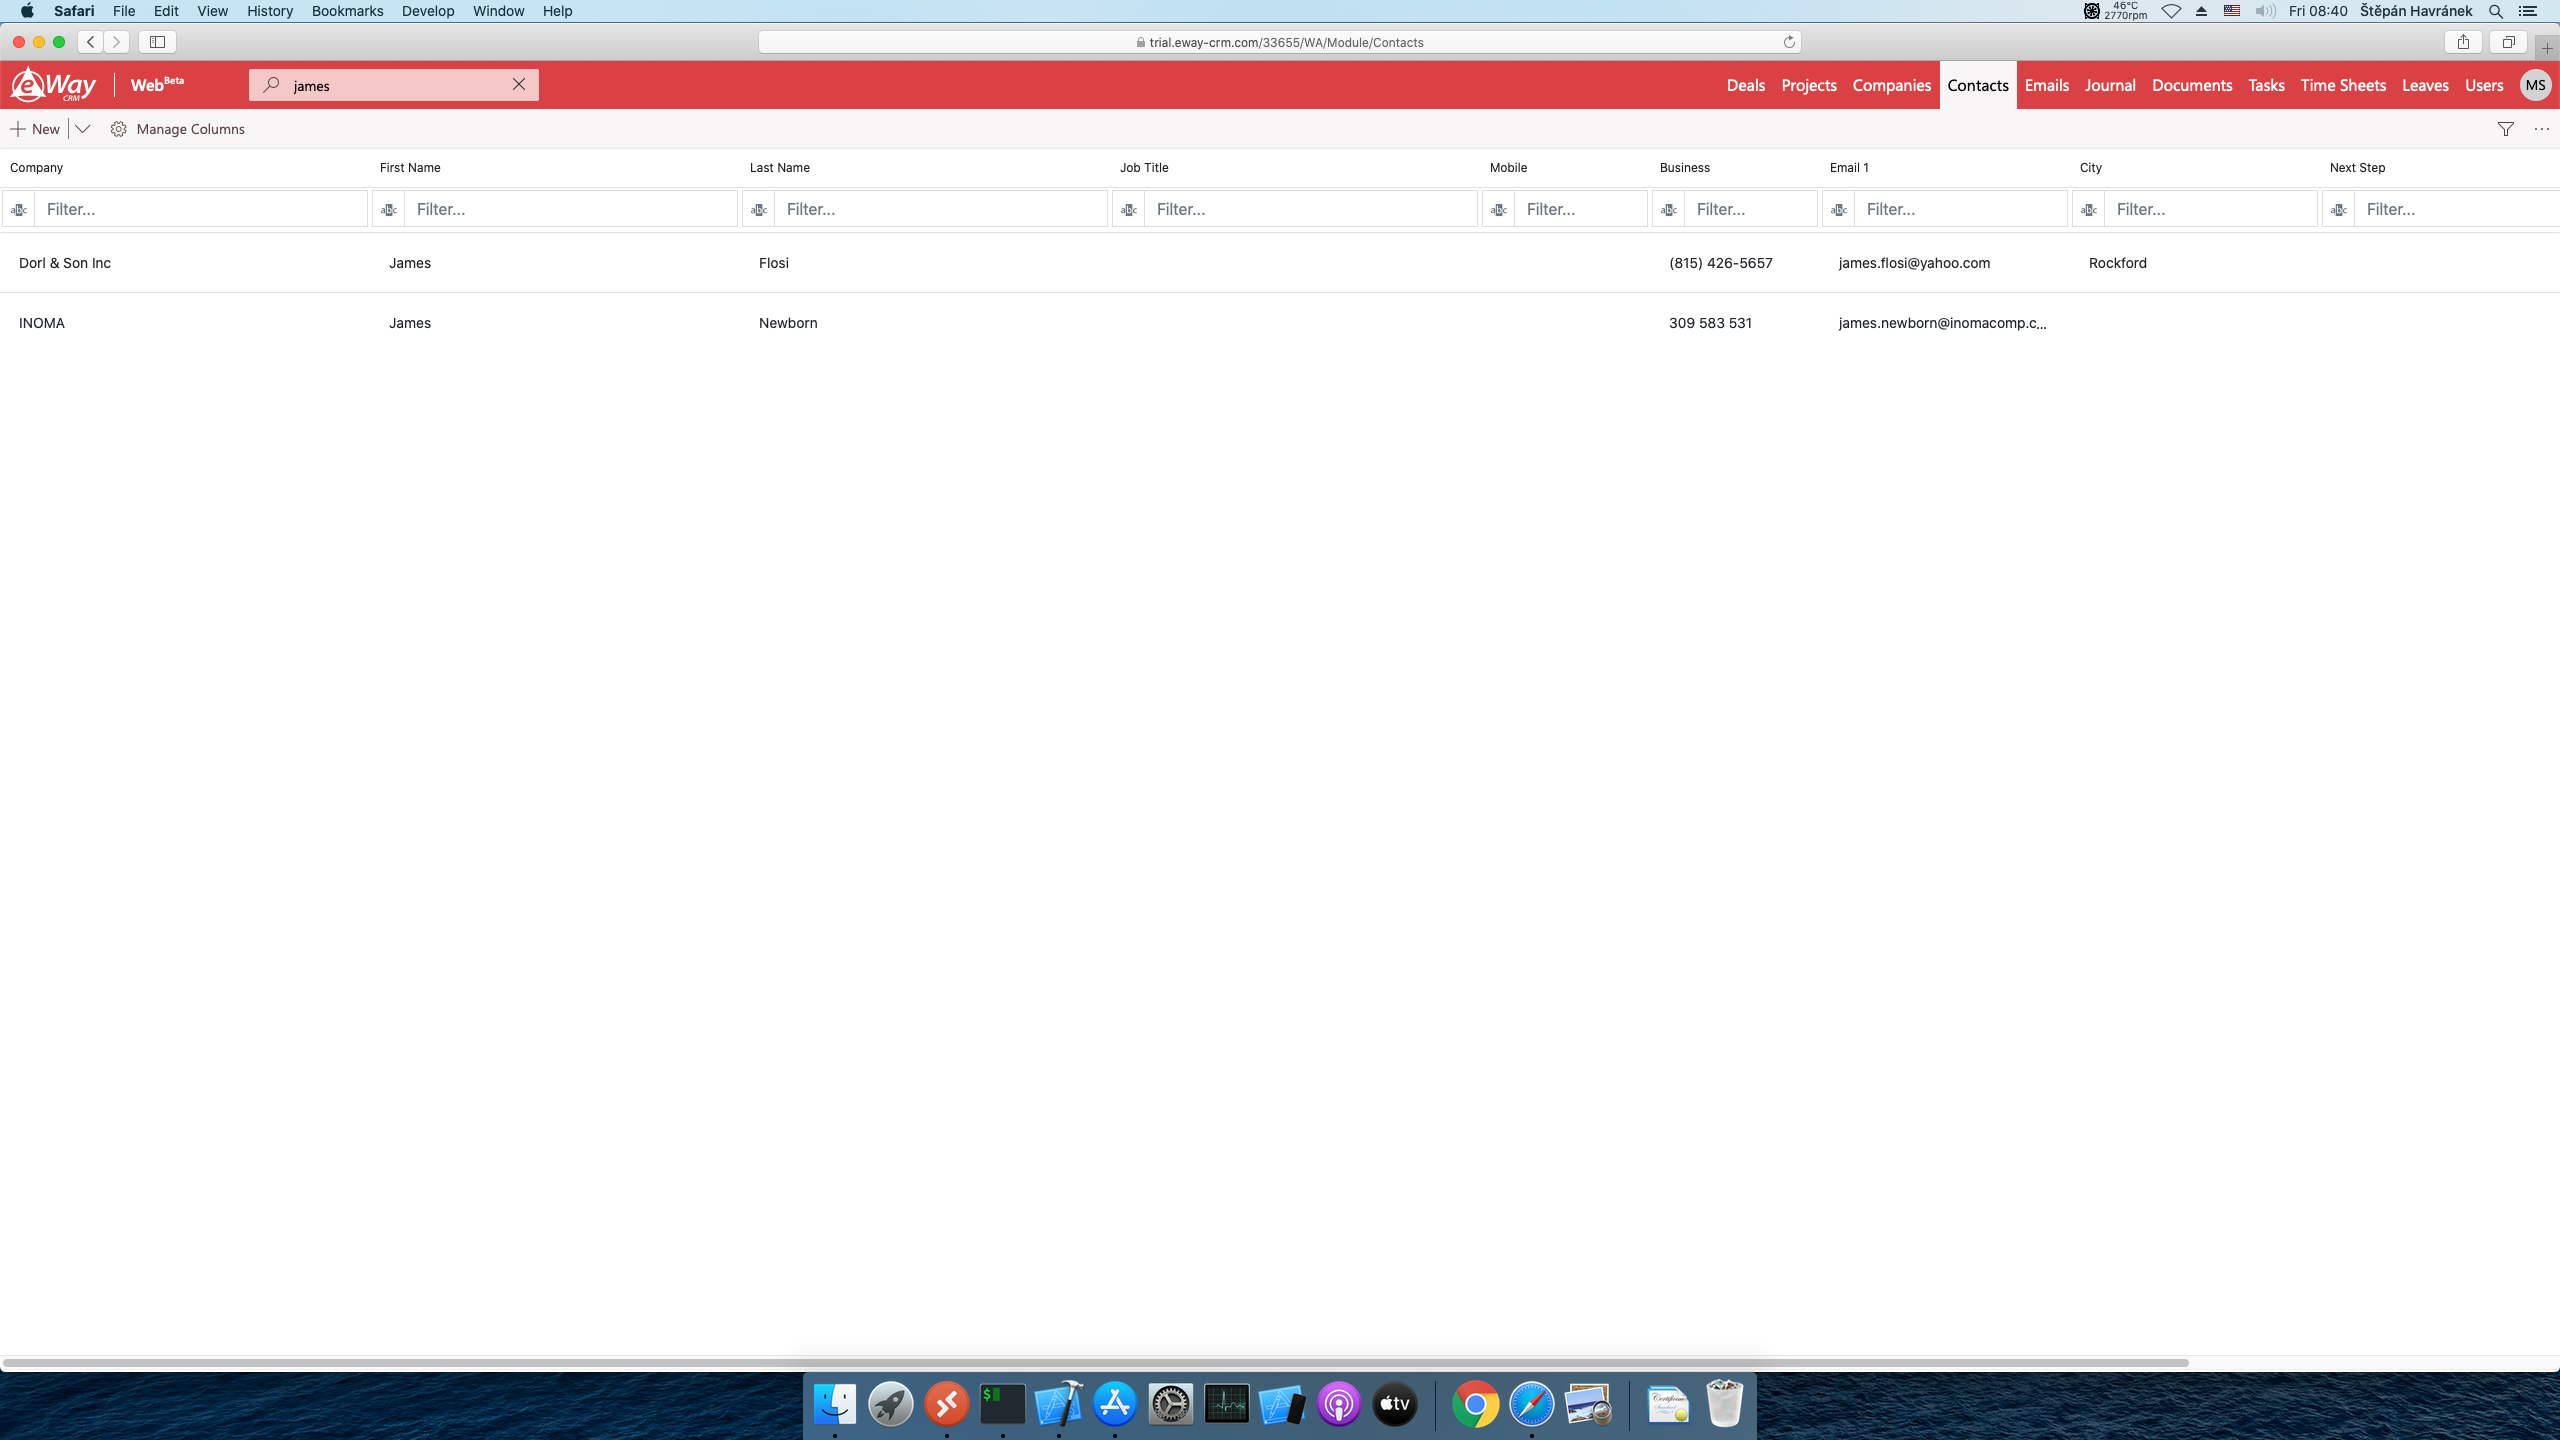 eWay-CRM contacts list